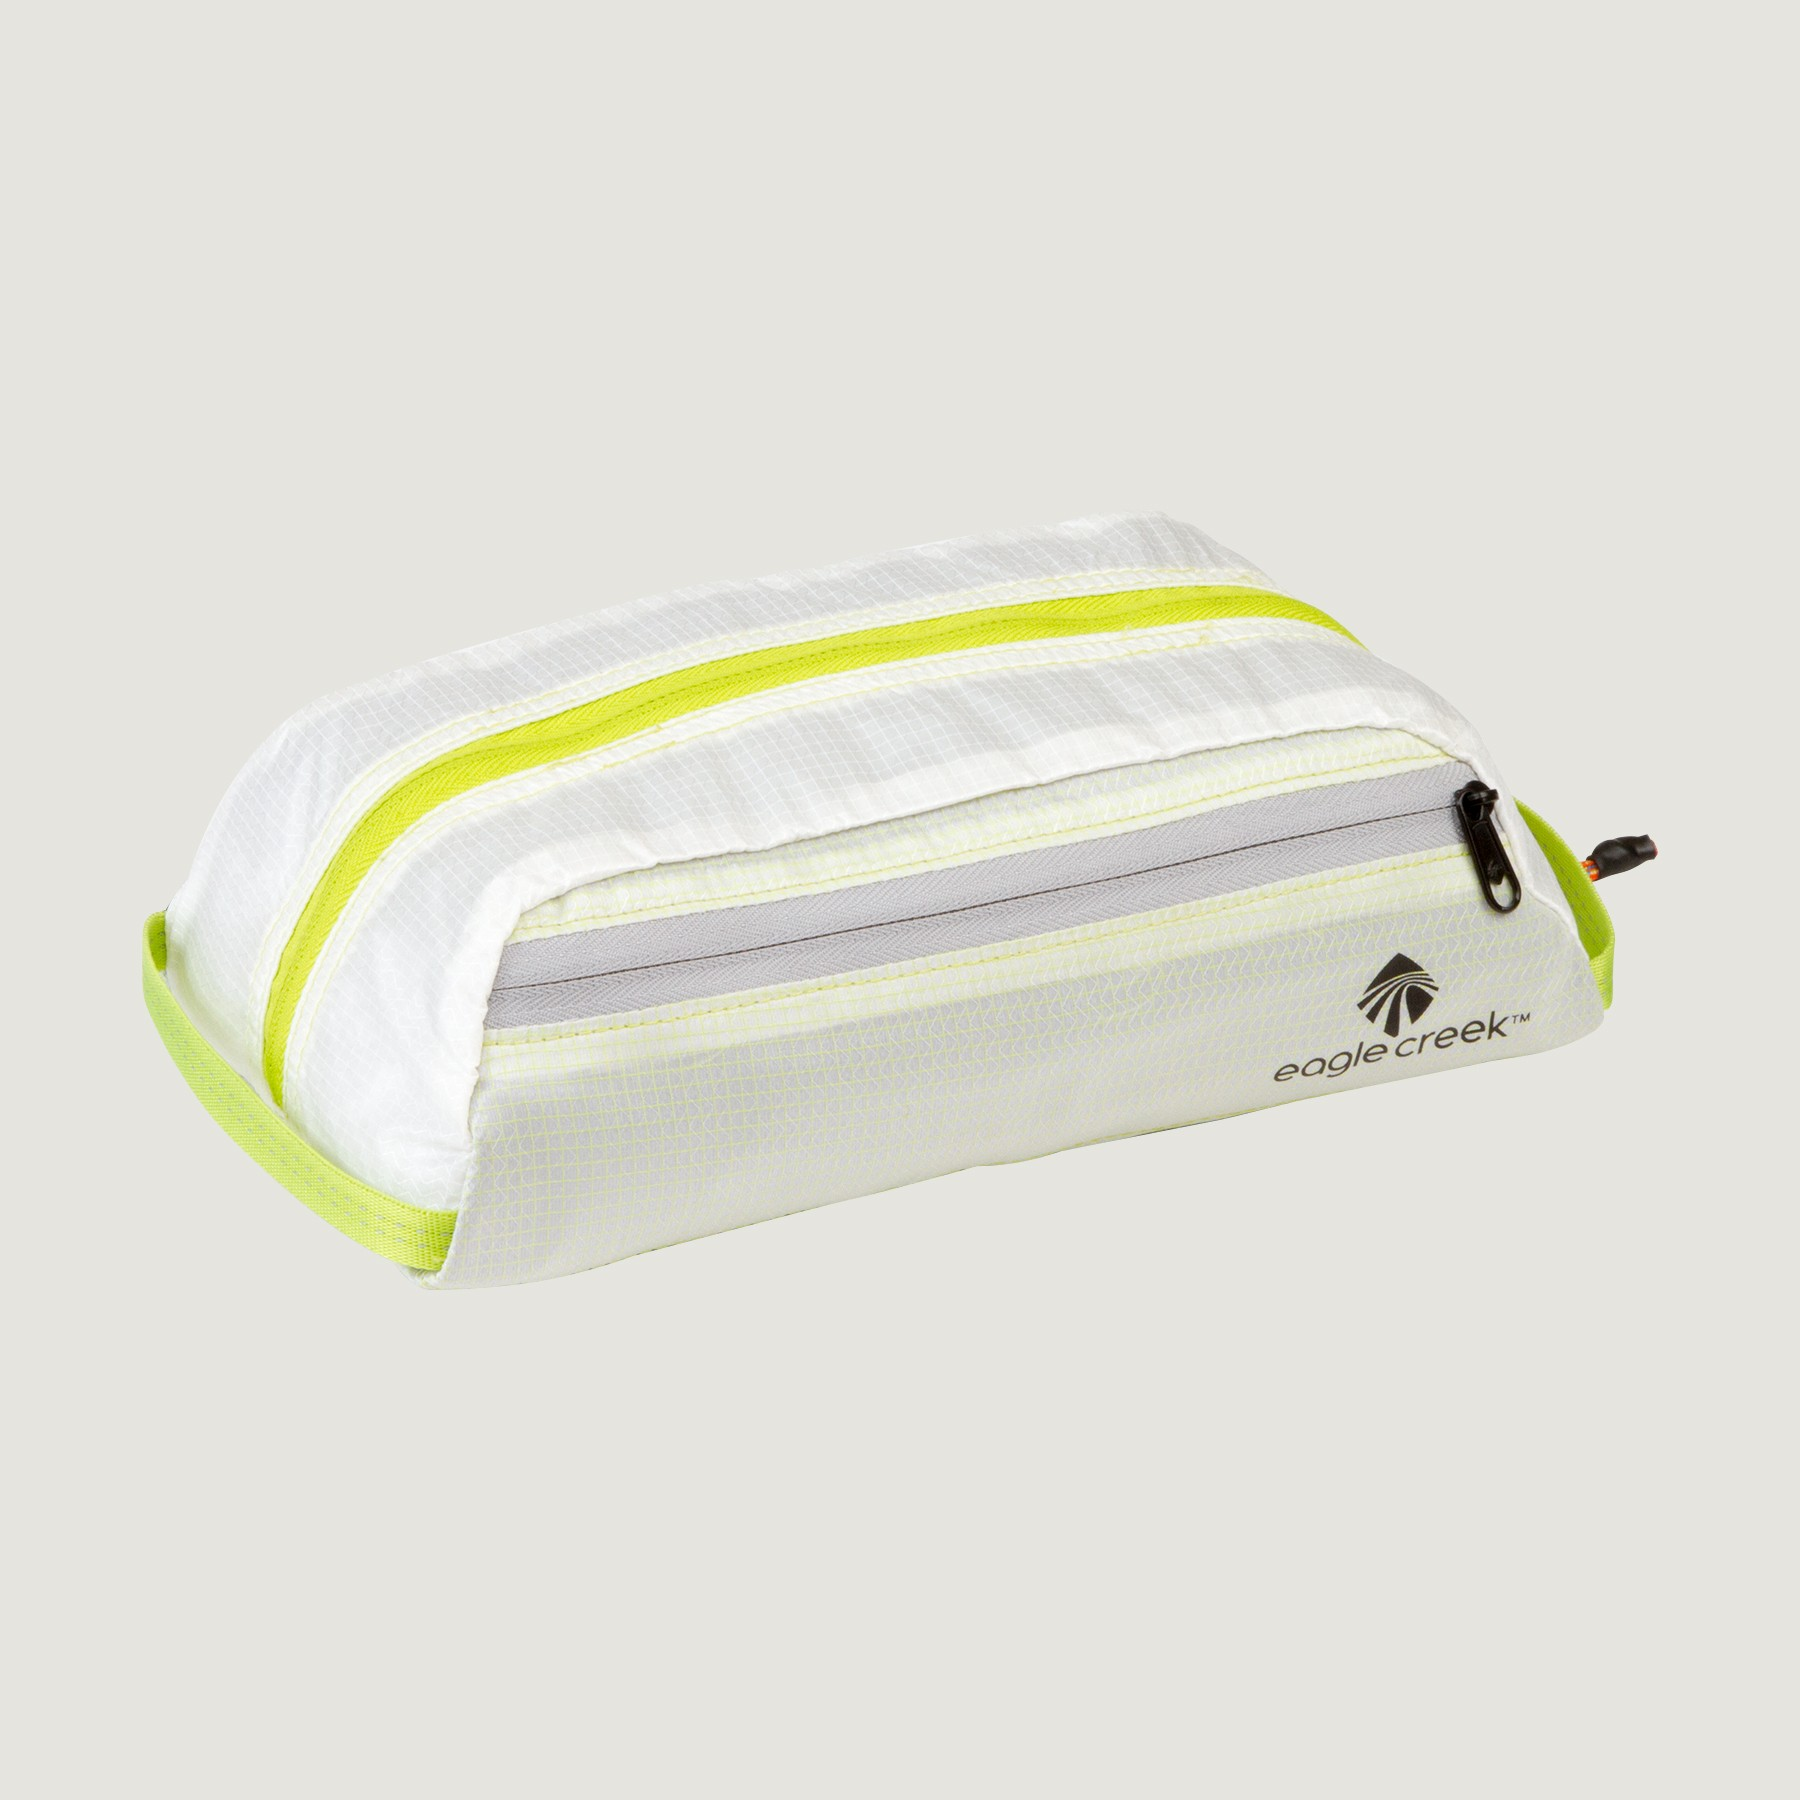 Pack-It Specter Tech™ Quick Trip